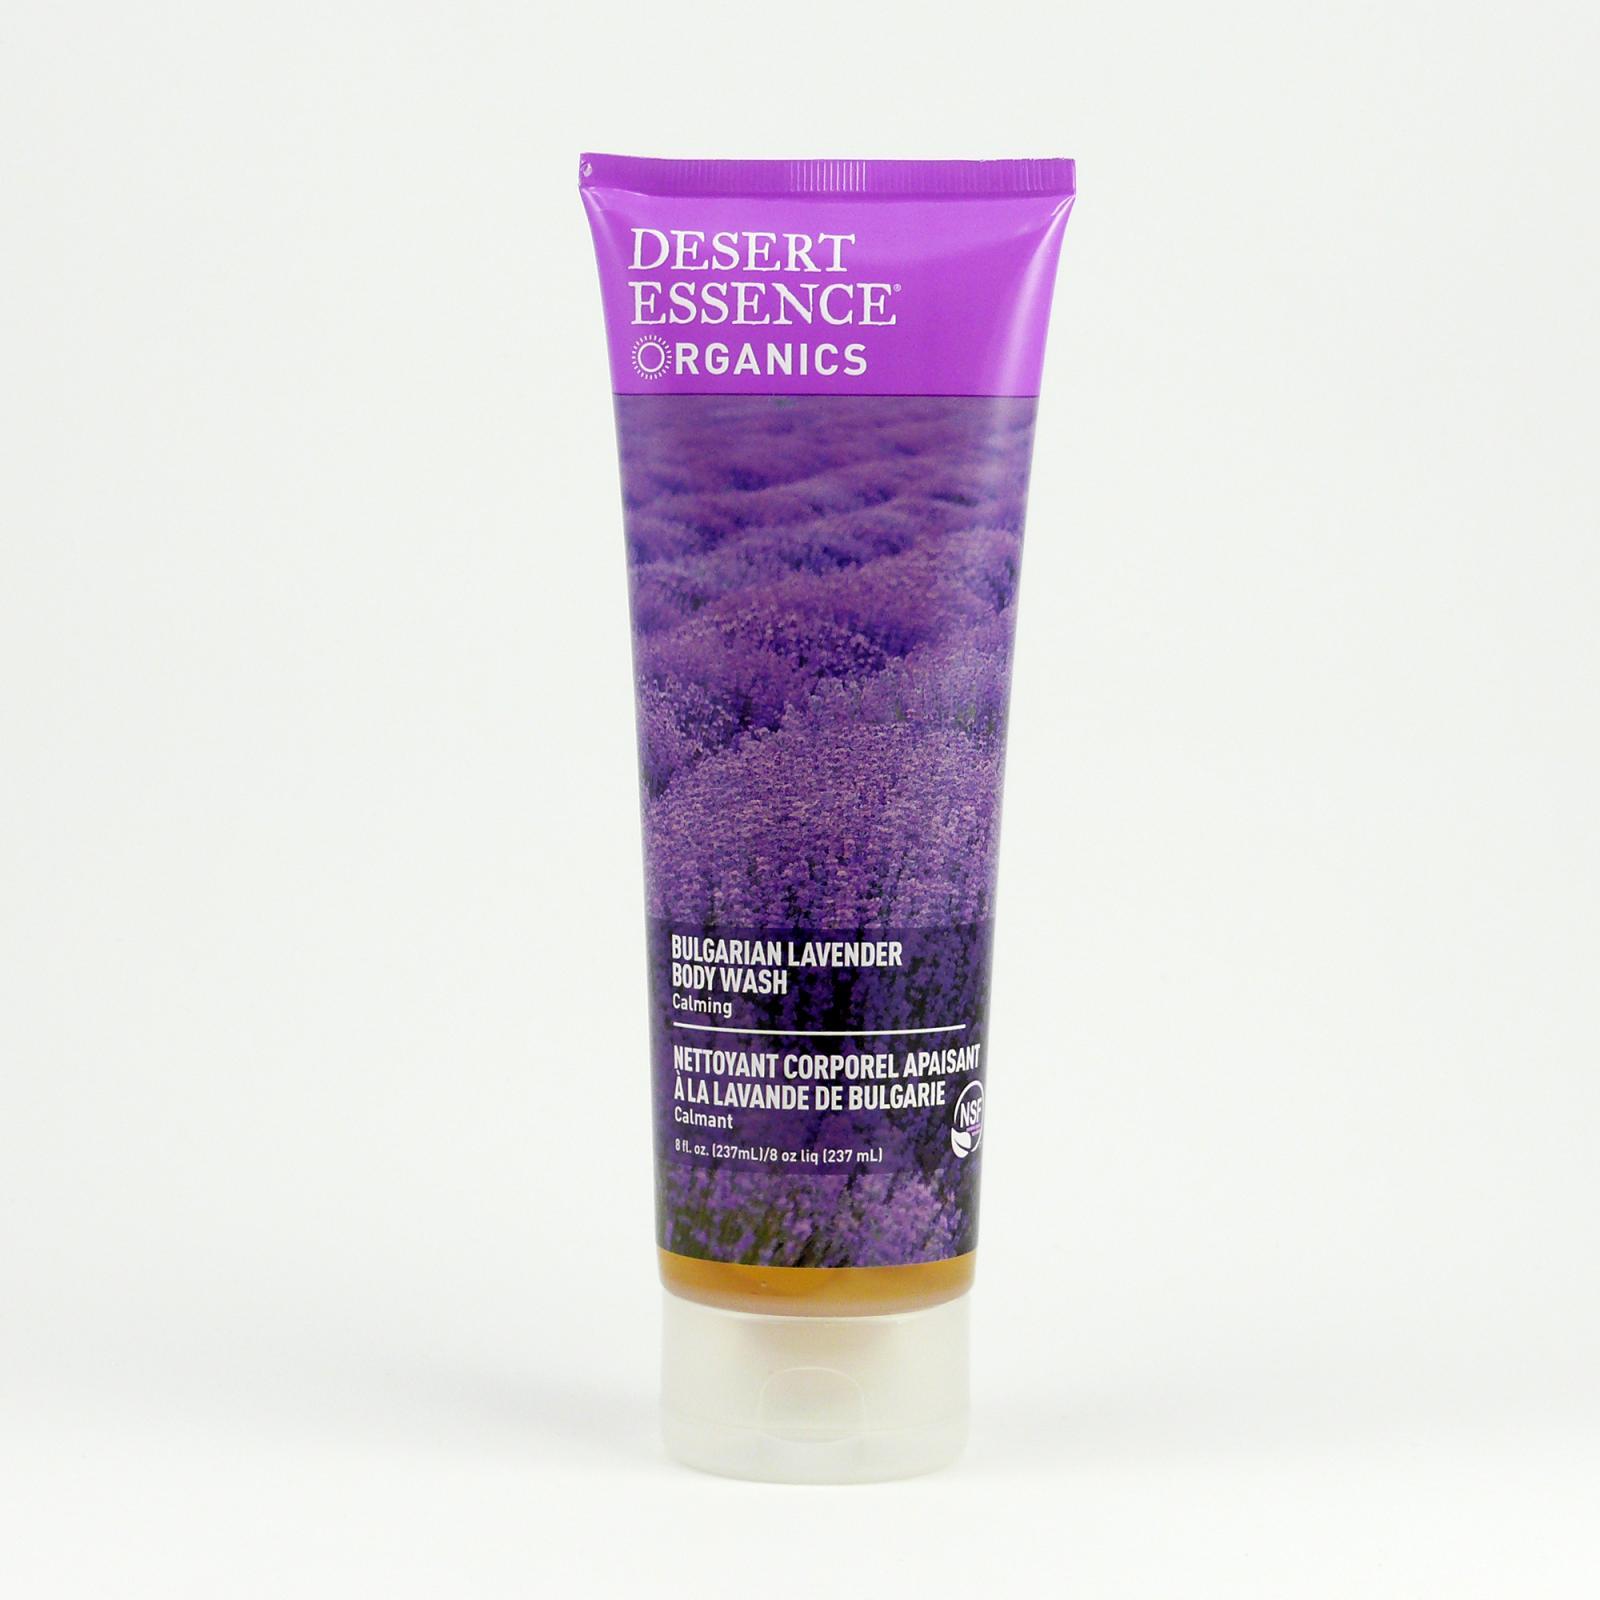 Desert Essence Sprchový gel levandule 237 ml